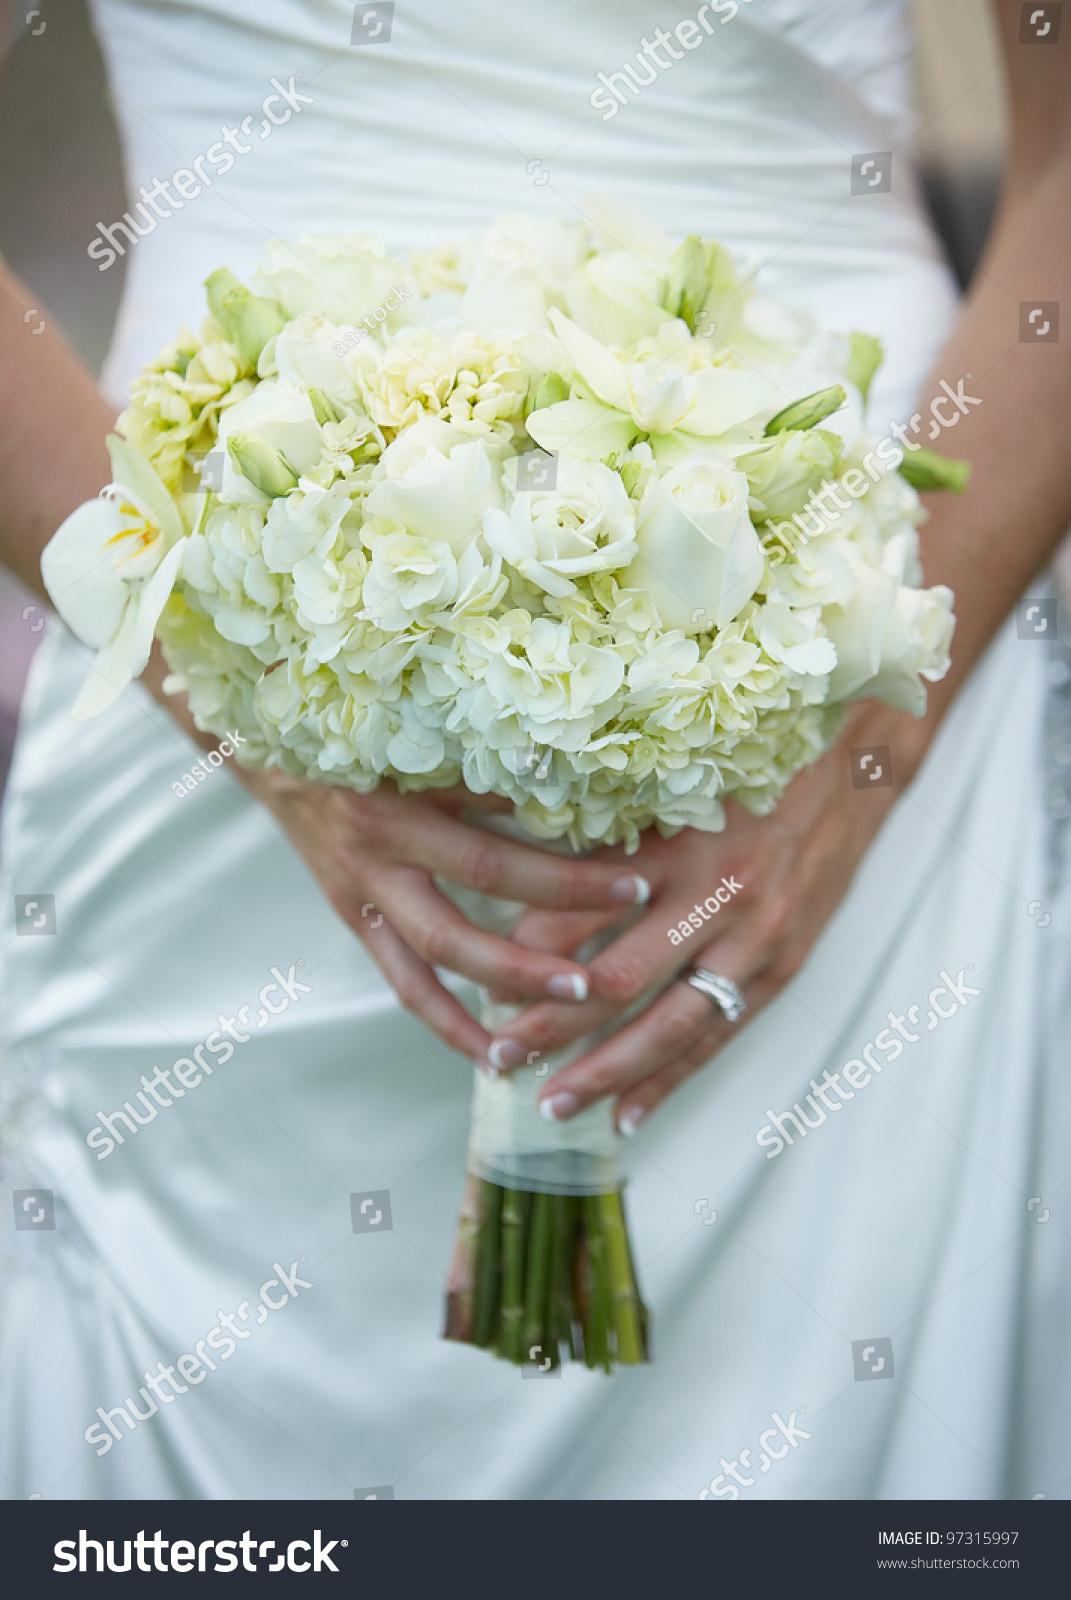 Bride holding wedding flower bouquet white stock photo edit now bride holding wedding flower bouquet of white roses izmirmasajfo